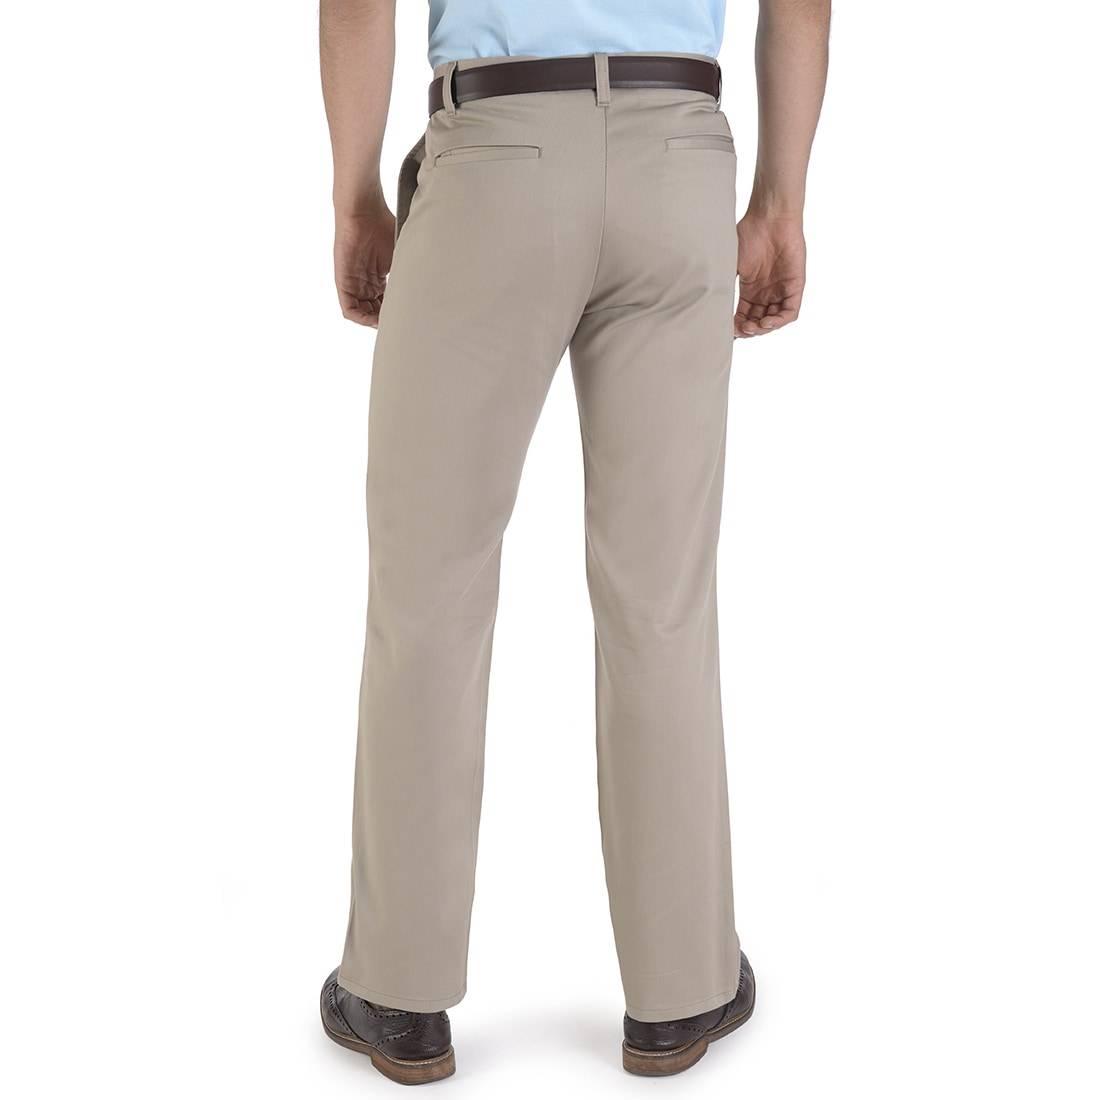 010789055267-02-Pantalon-Casual-Classic-Fit-Beige-yale